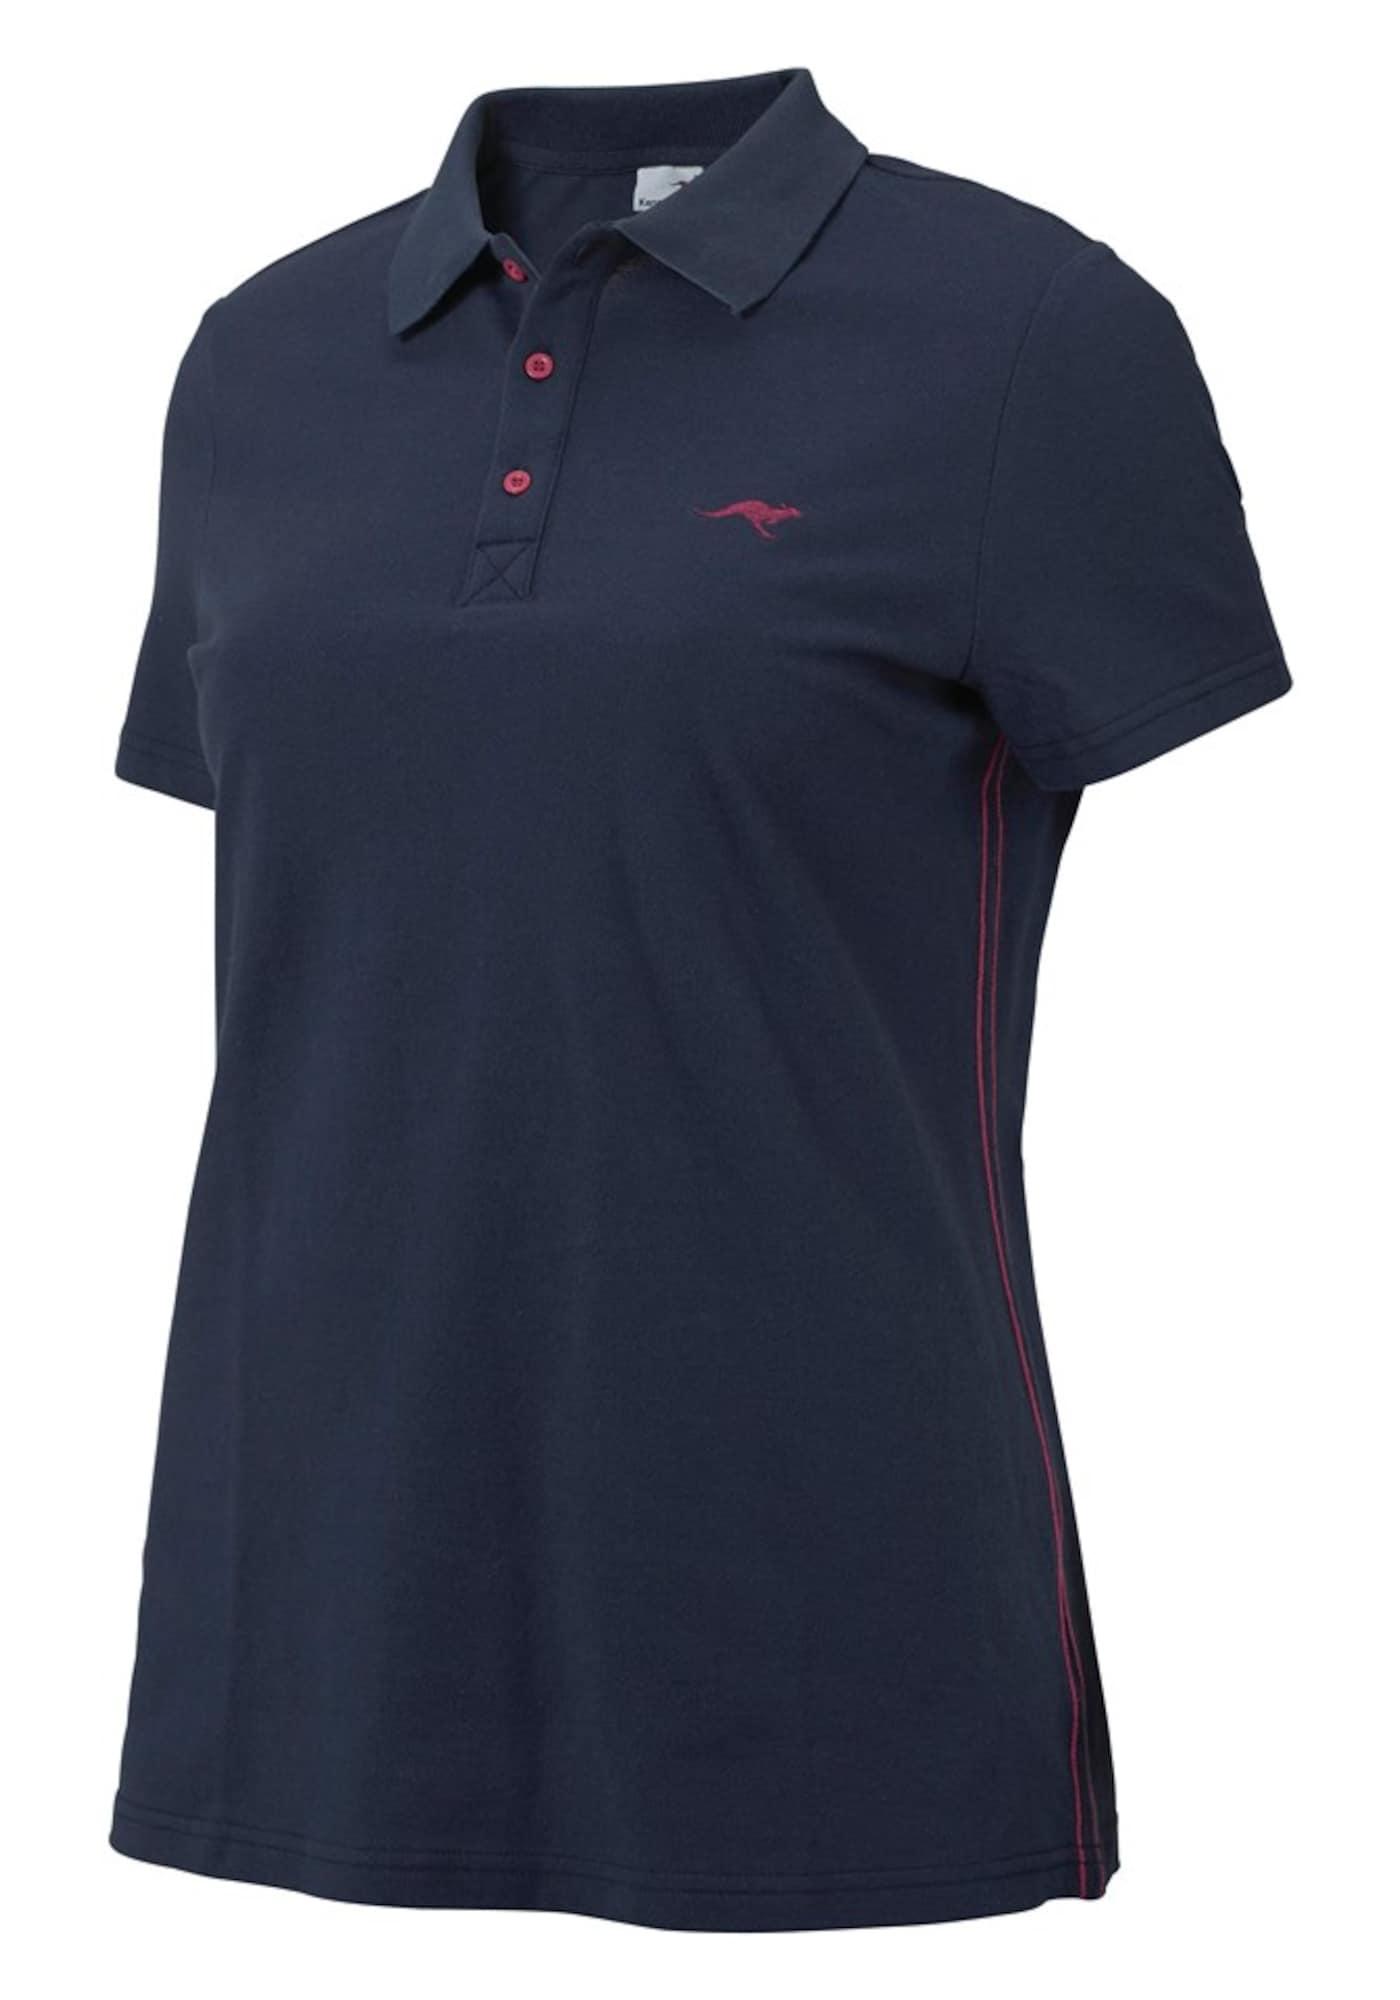 Poloshirt | Bekleidung > Shirts > Poloshirts | Kangaroos